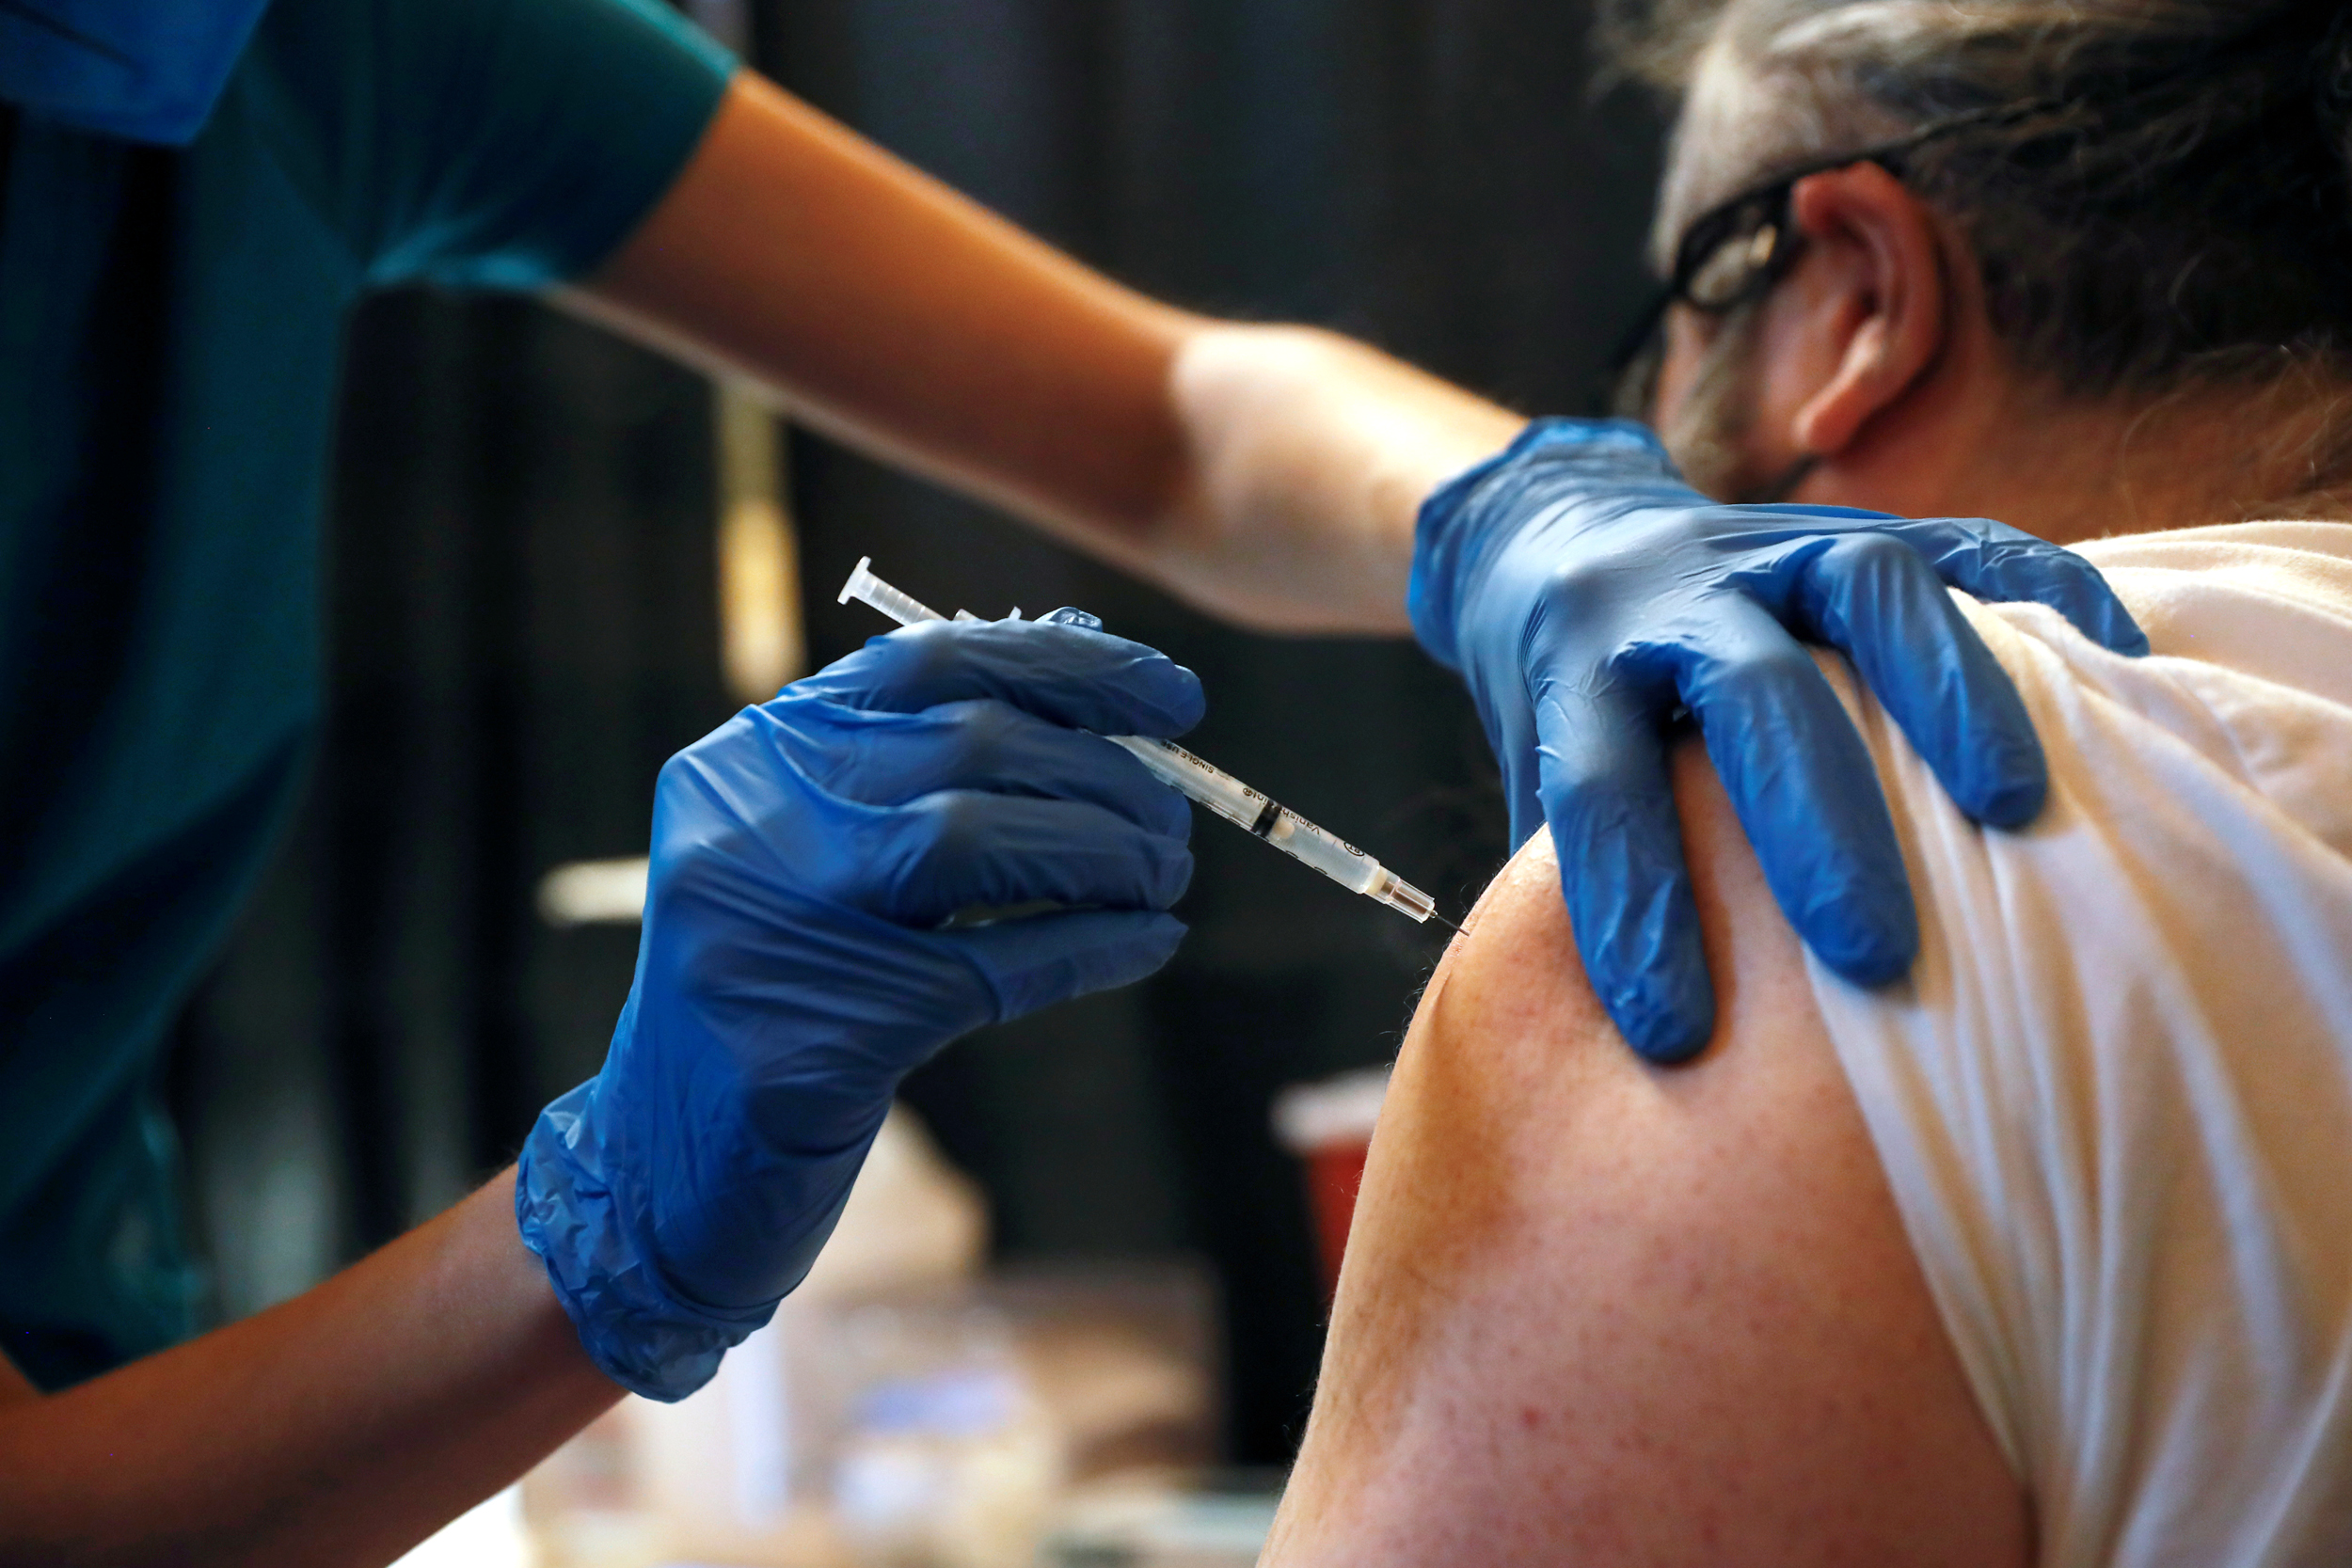 CDC director endorses Pfizer Covid vaccine booster shot